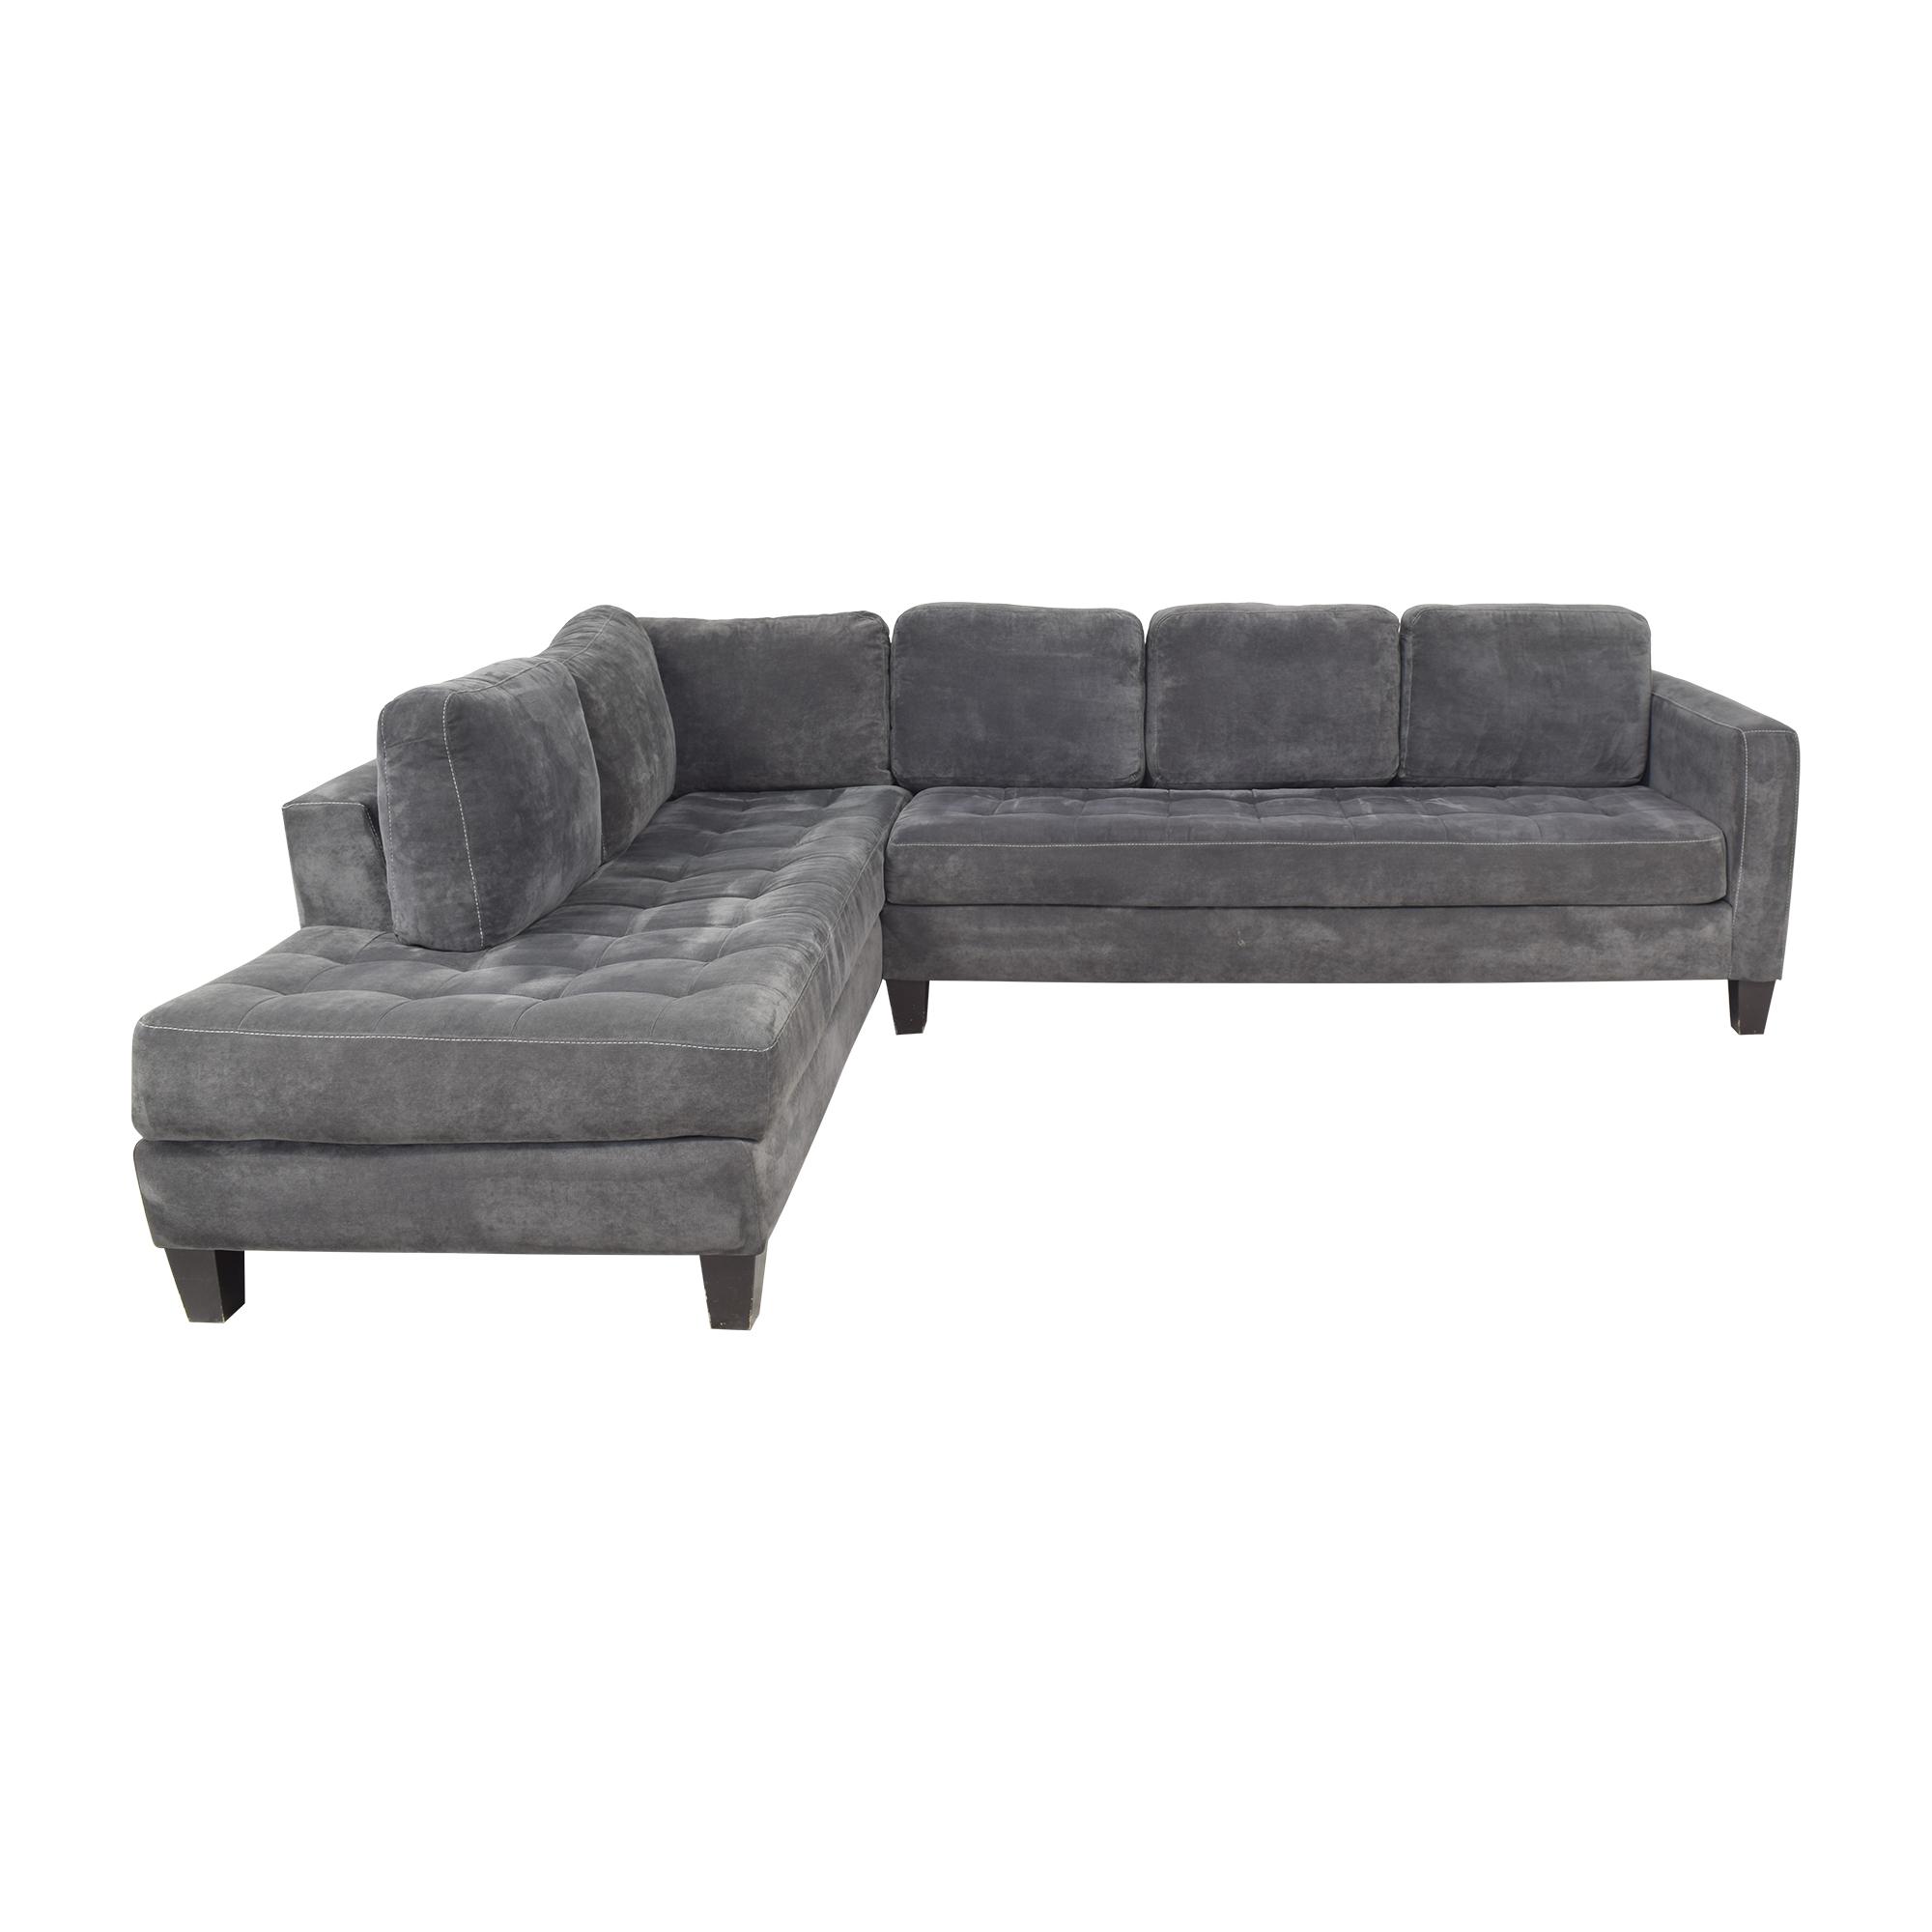 shop Macy's Macy's Milo Sectional Sofa online